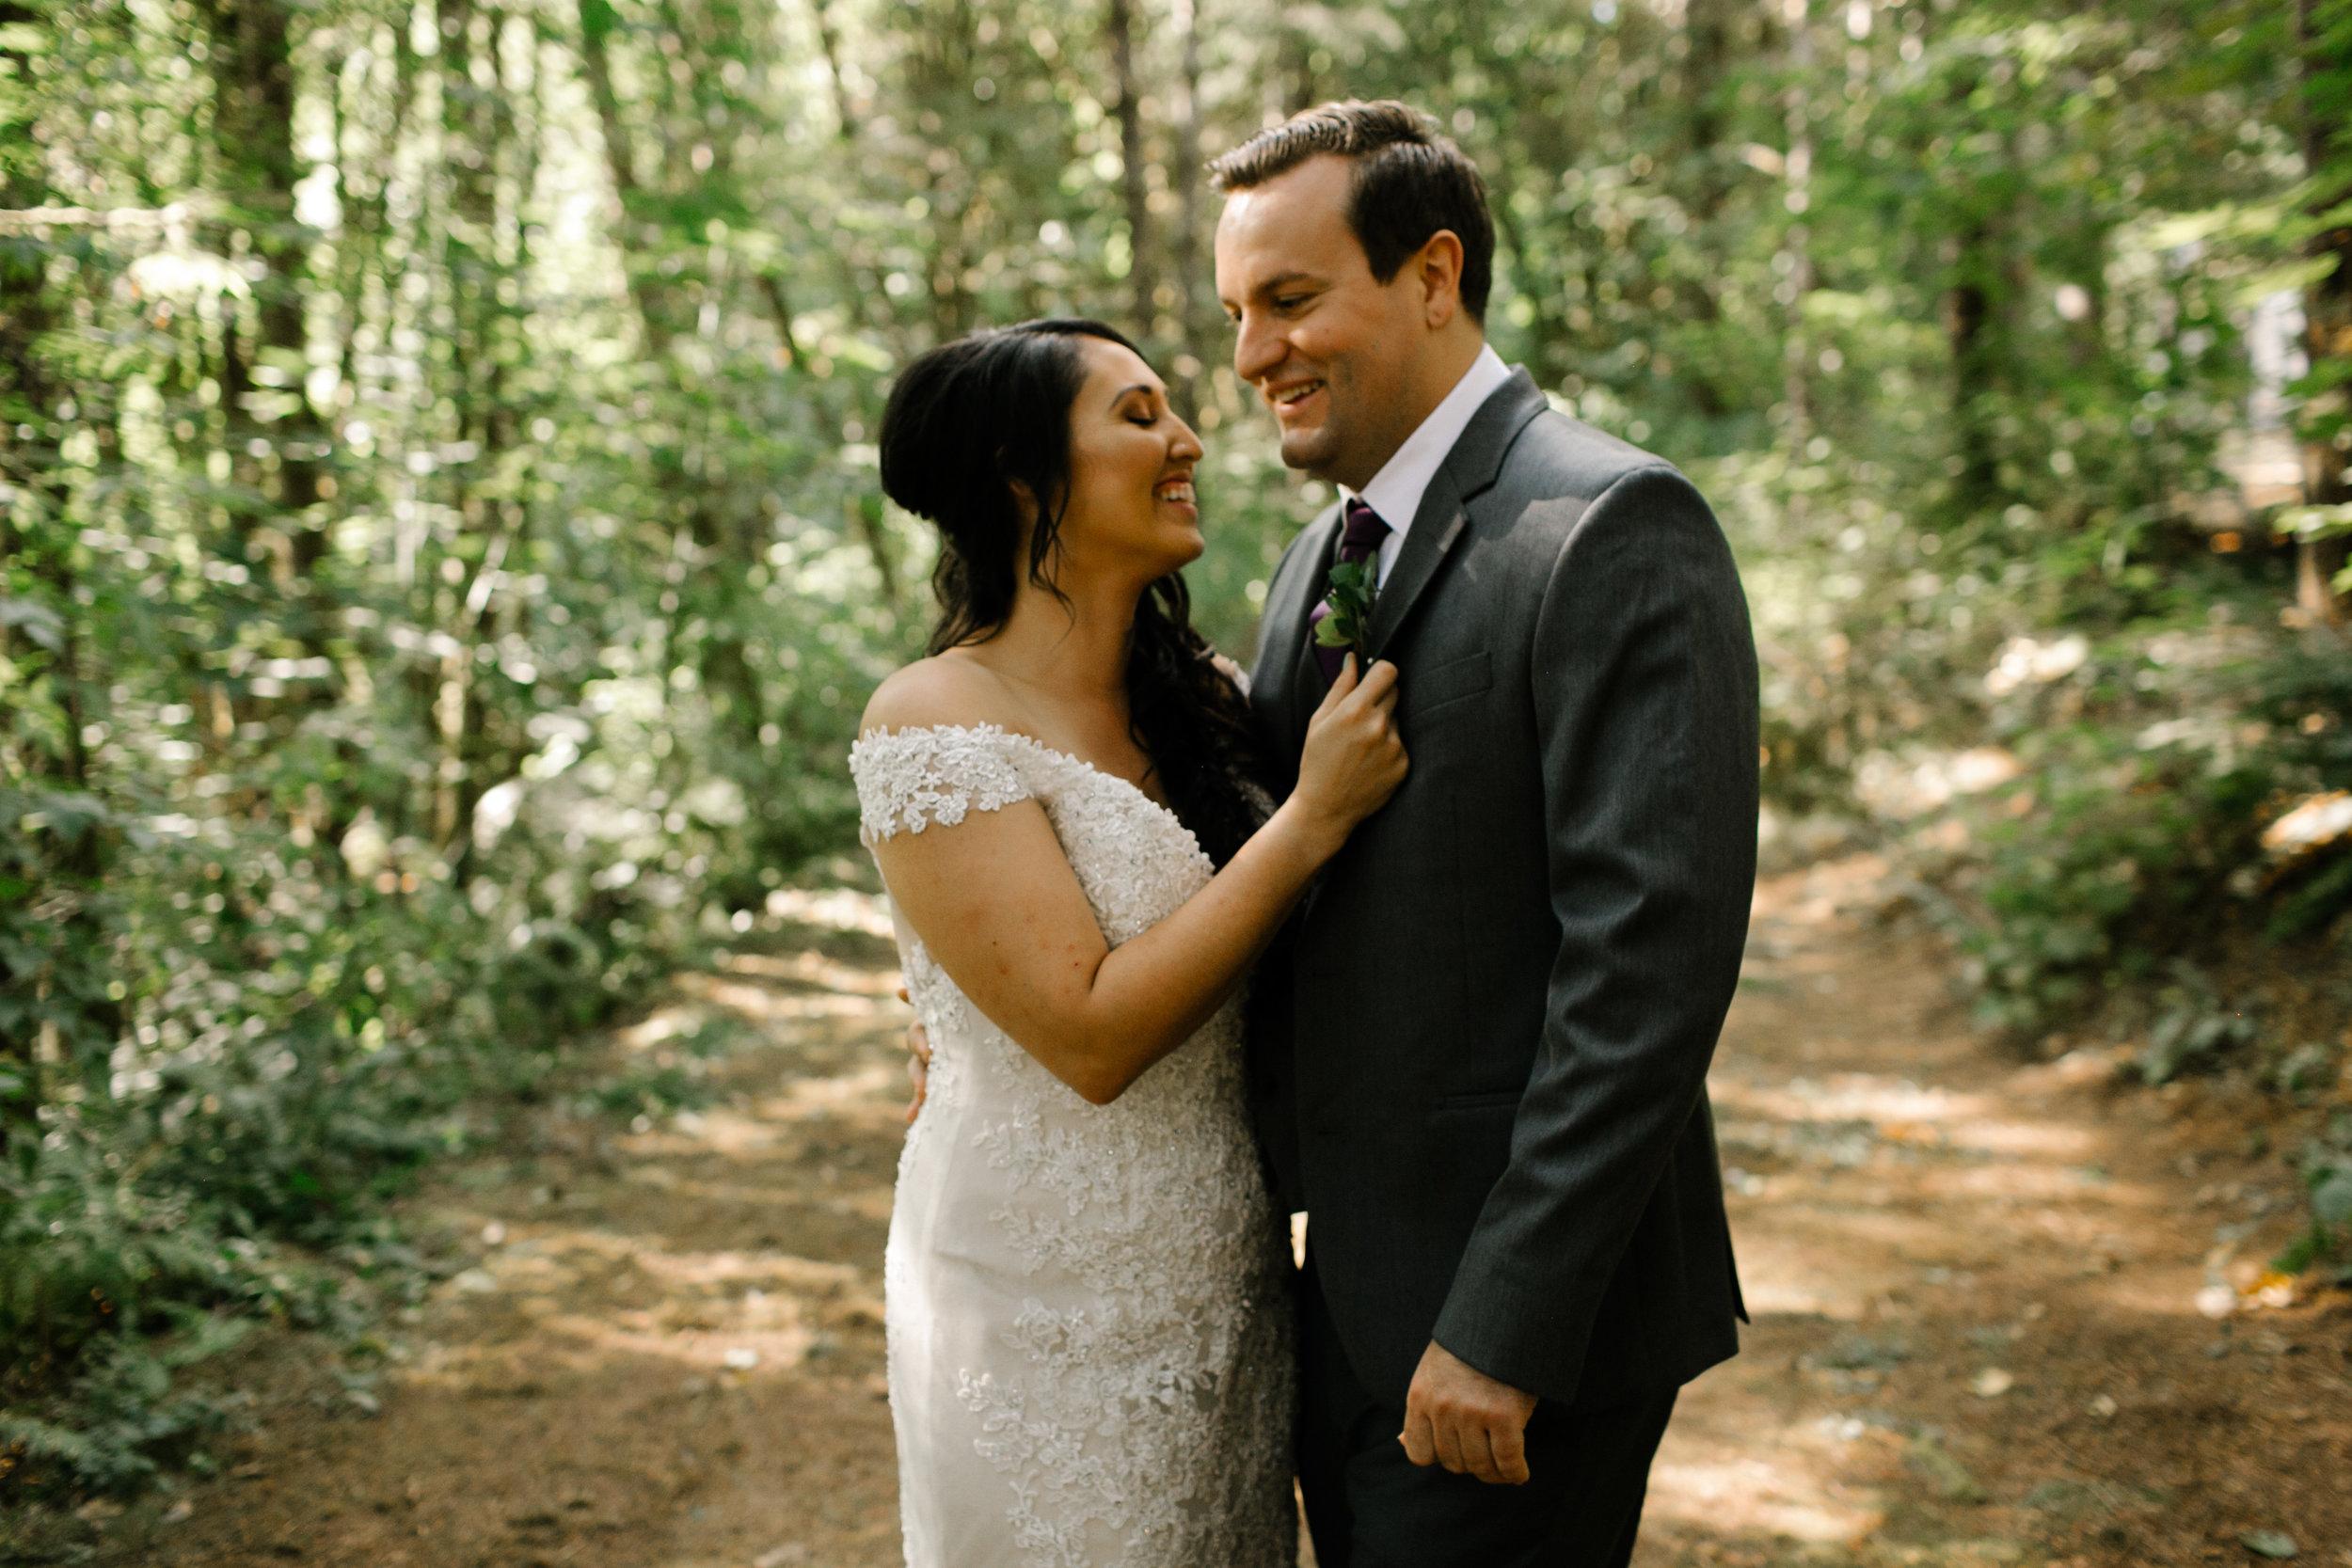 Sevlynn-Photography-Teresa-Chandler-Wedding-17.jpg